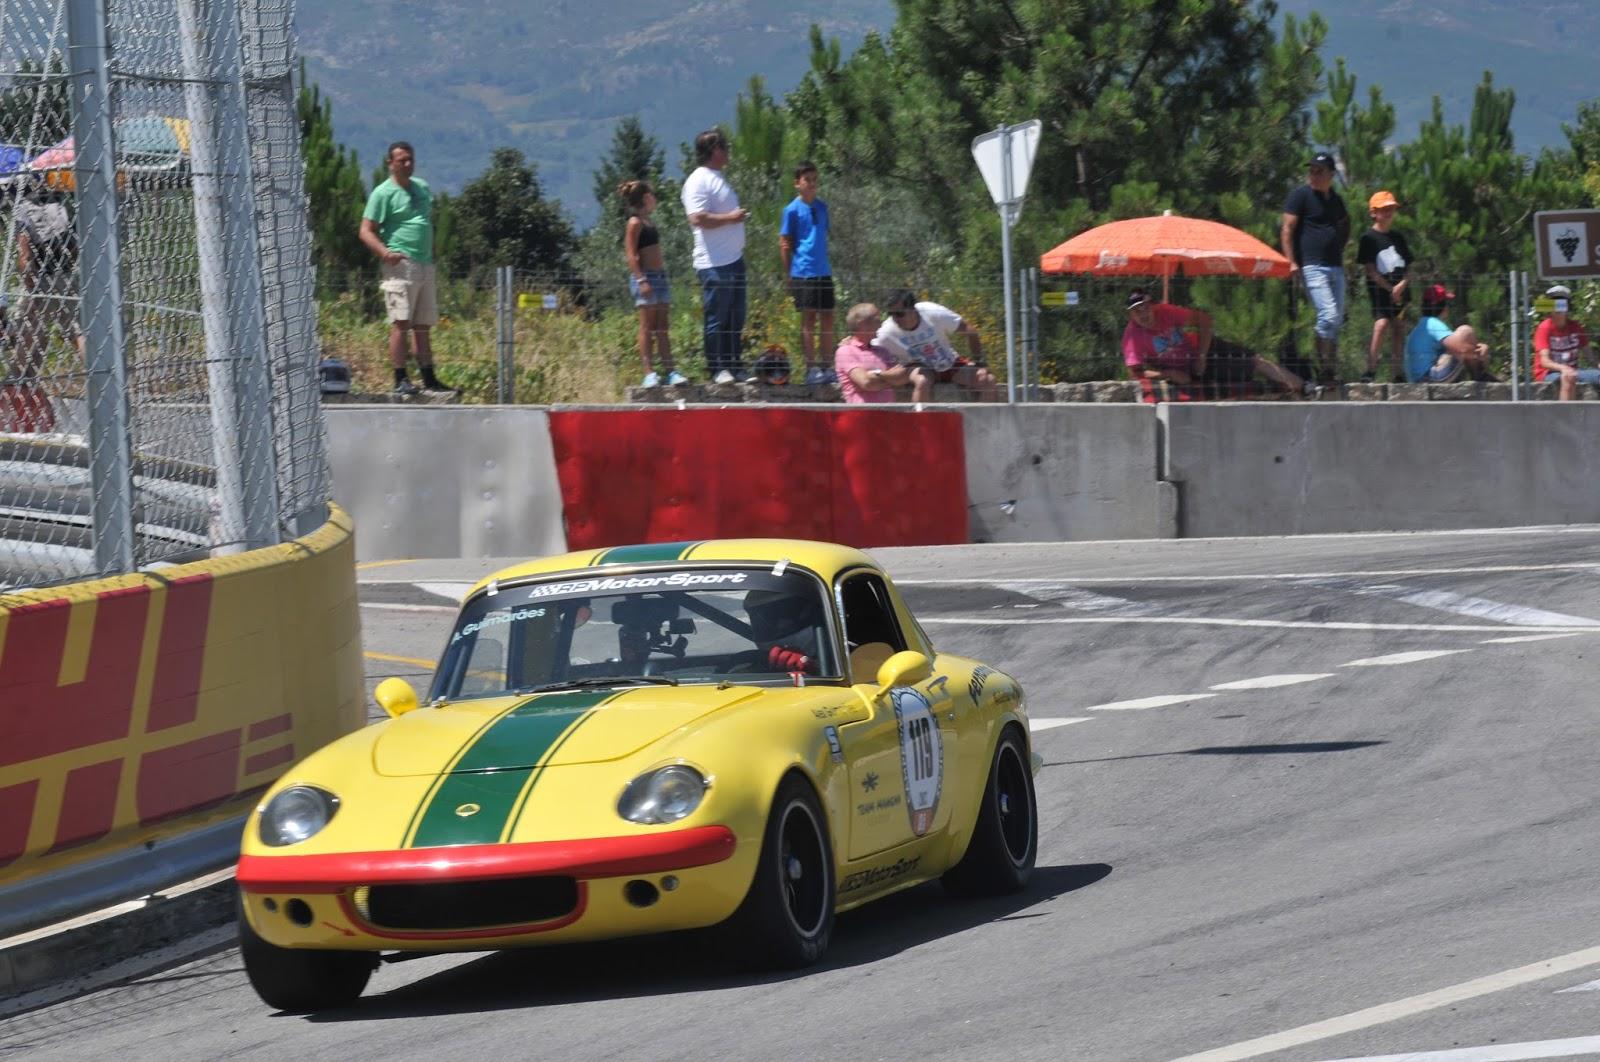 Circuito Vila Real : Mscfotorali circuito de vila real o regresso do team mancha Às